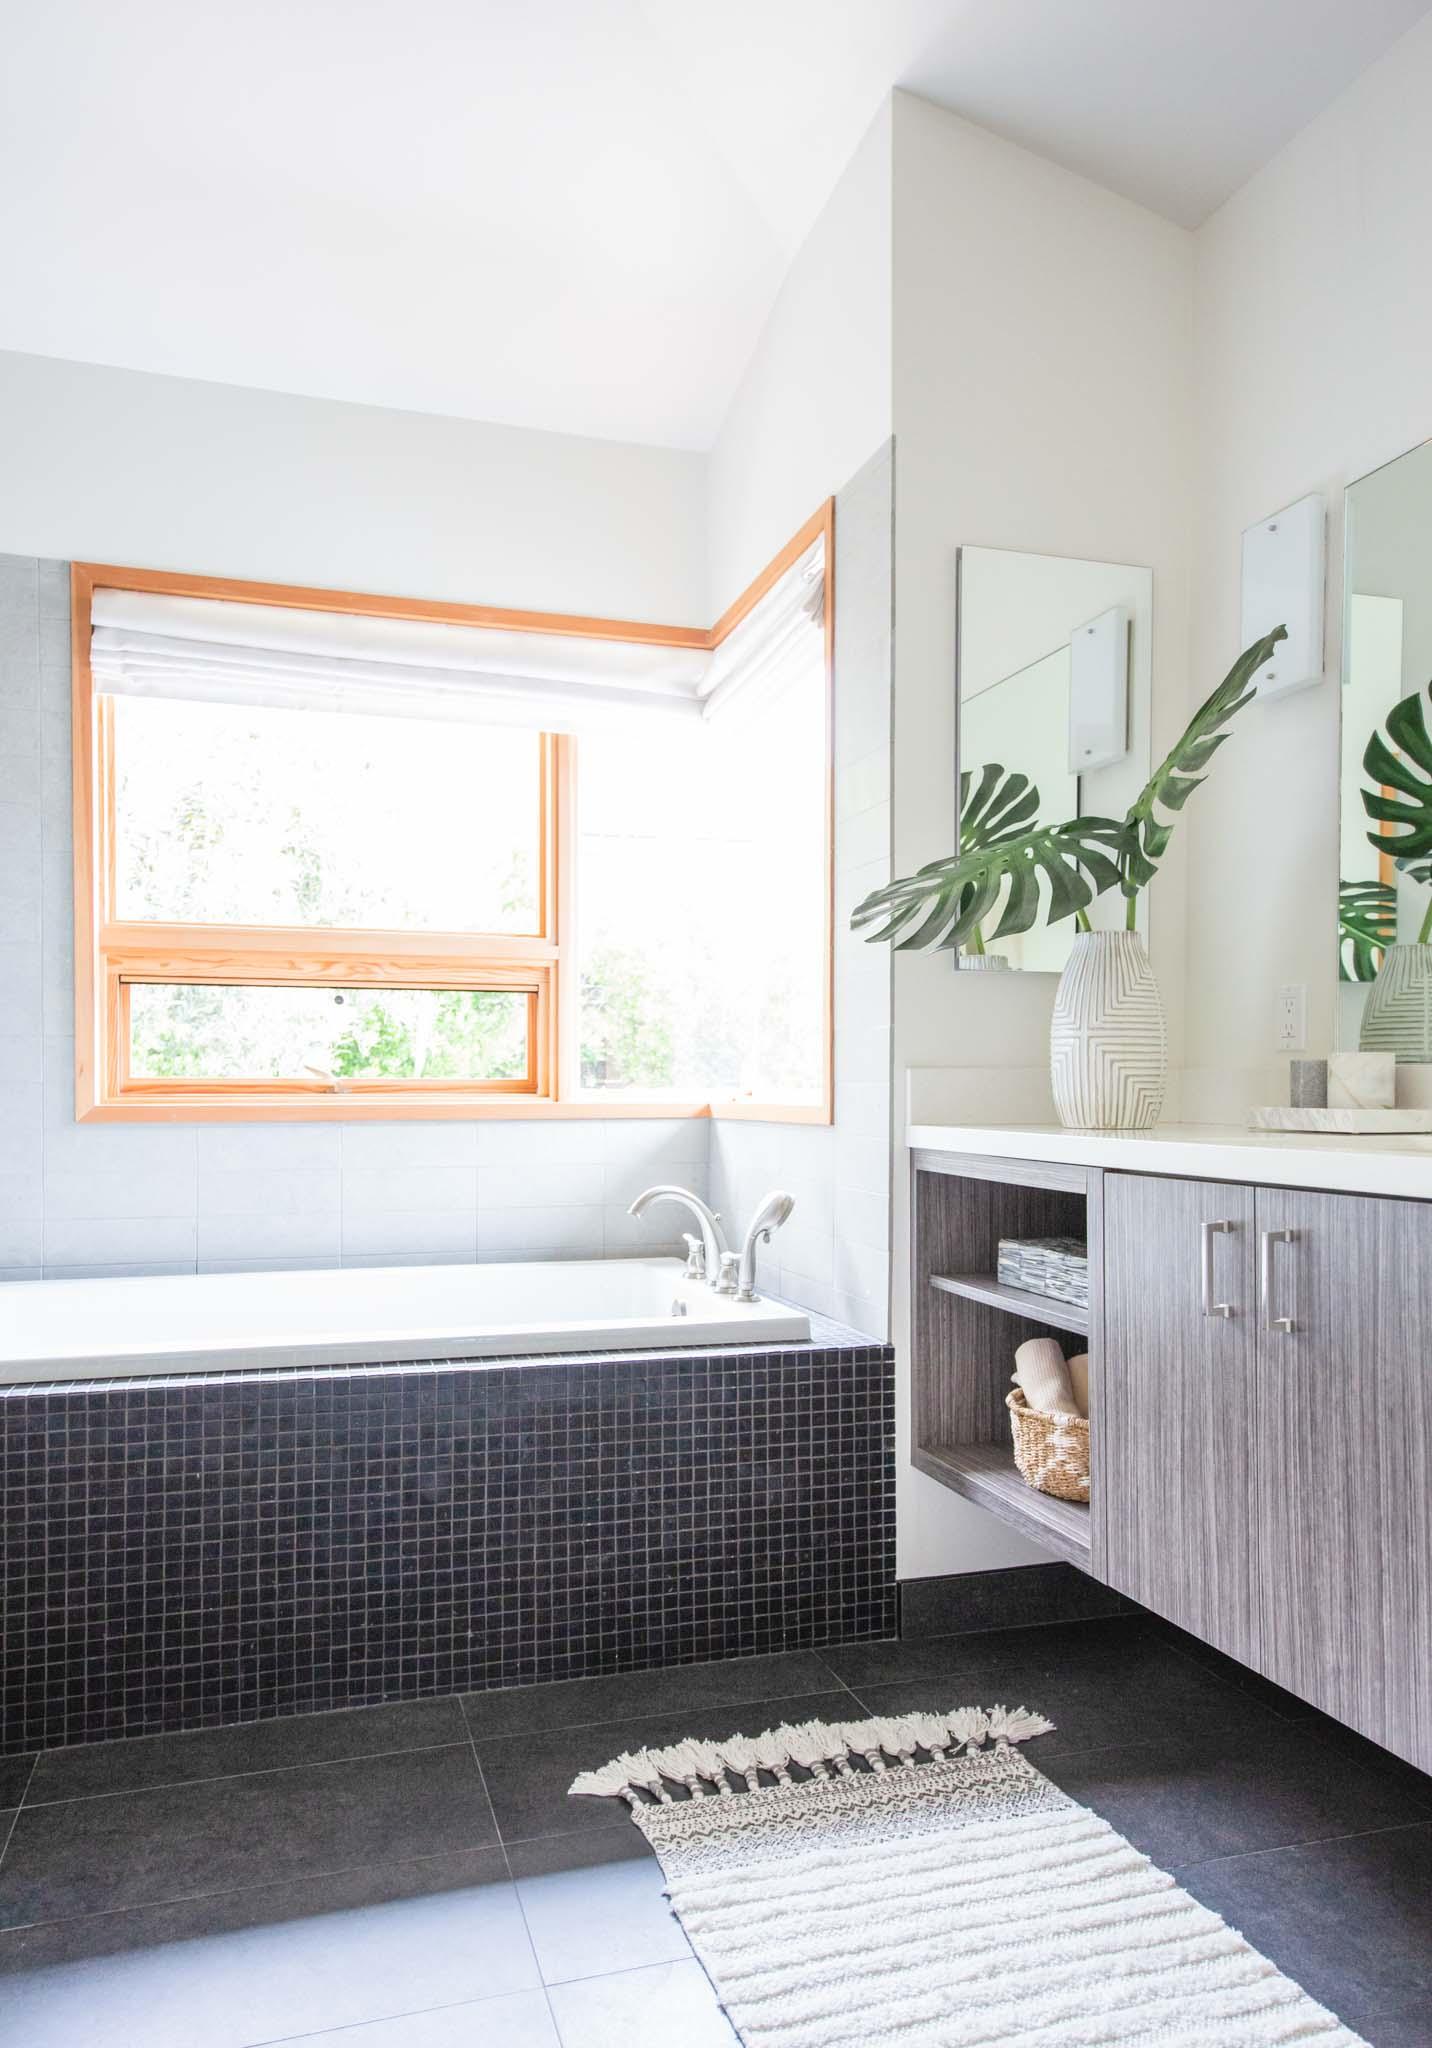 Jodi G Designs | Santa Barbara Interior Design Lanscape -44.jpg